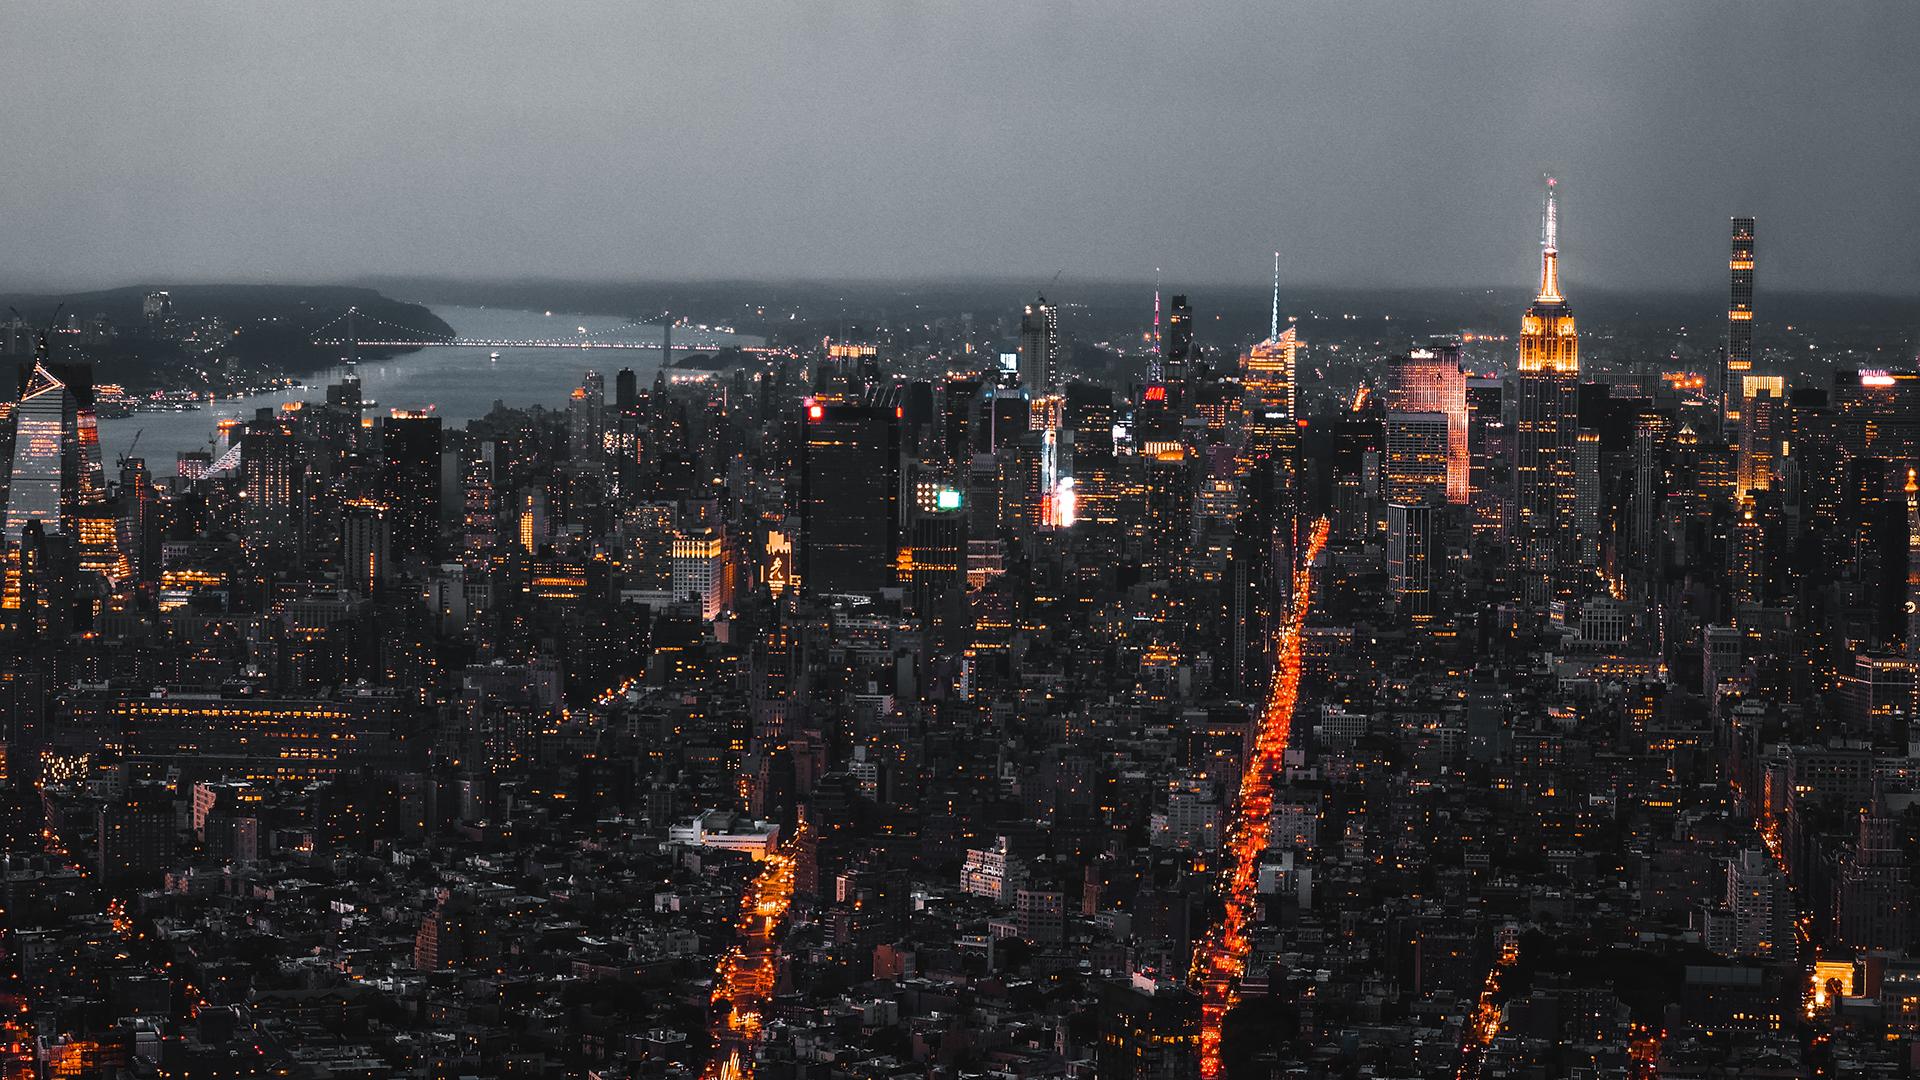 Best Wallpaper Night Empire State Building - city-lights-building-New-York-City-Empire-State-Building-Manhattan-1302041  Best Photo Reference-395678.jpg